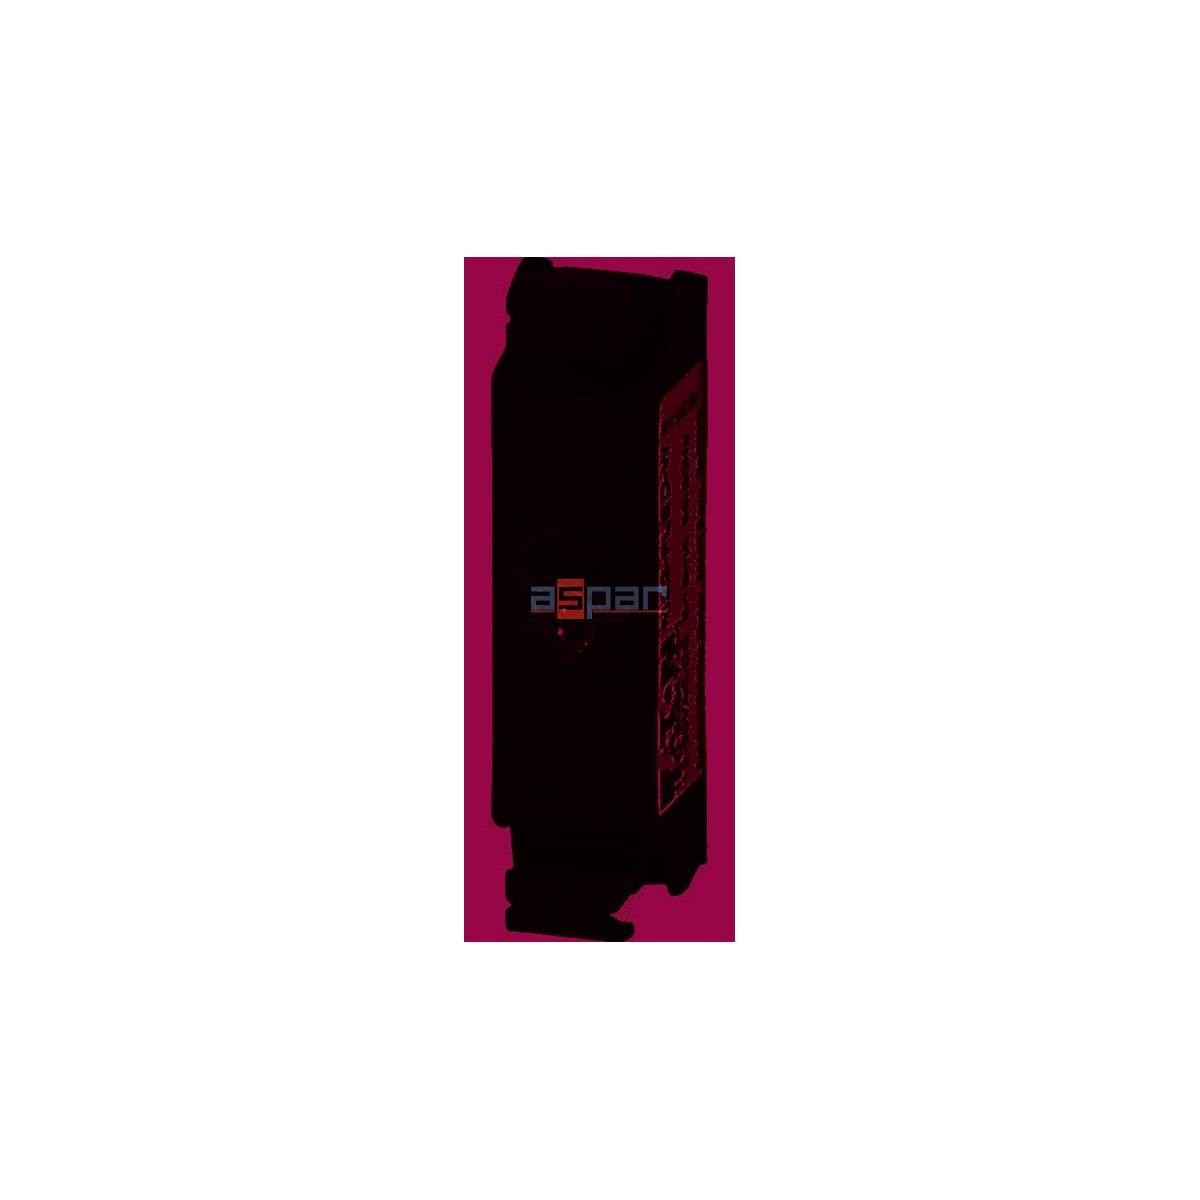 Dioda LED płaska, zielona, M22-FLED-G, 180798